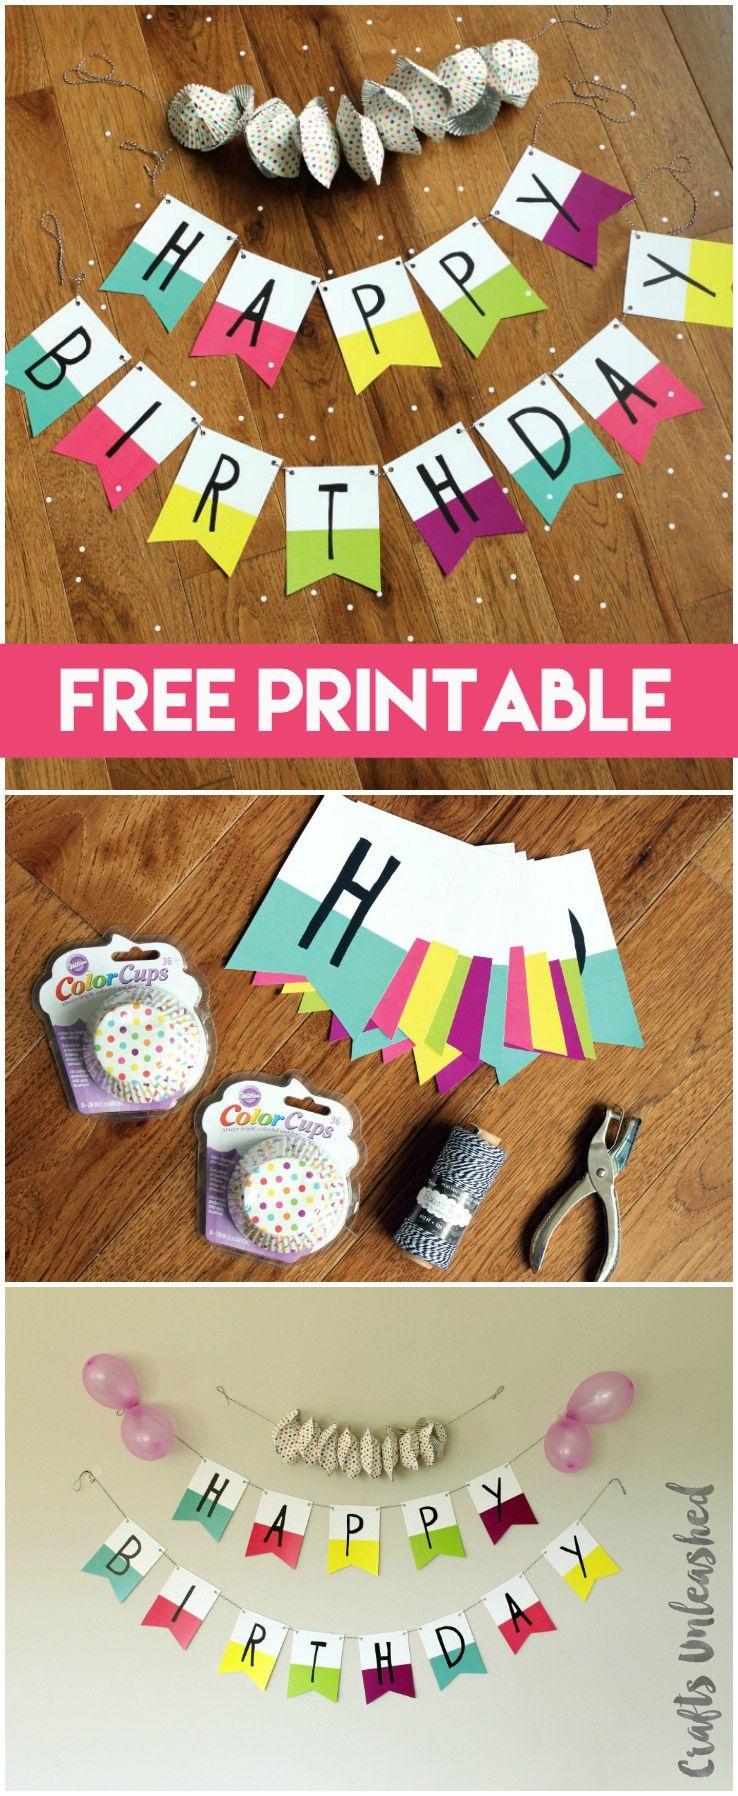 Free Printable Banner: Happy Birthday Pennants - Consumer Crafts | A - Diy Birthday Banner Free Printable